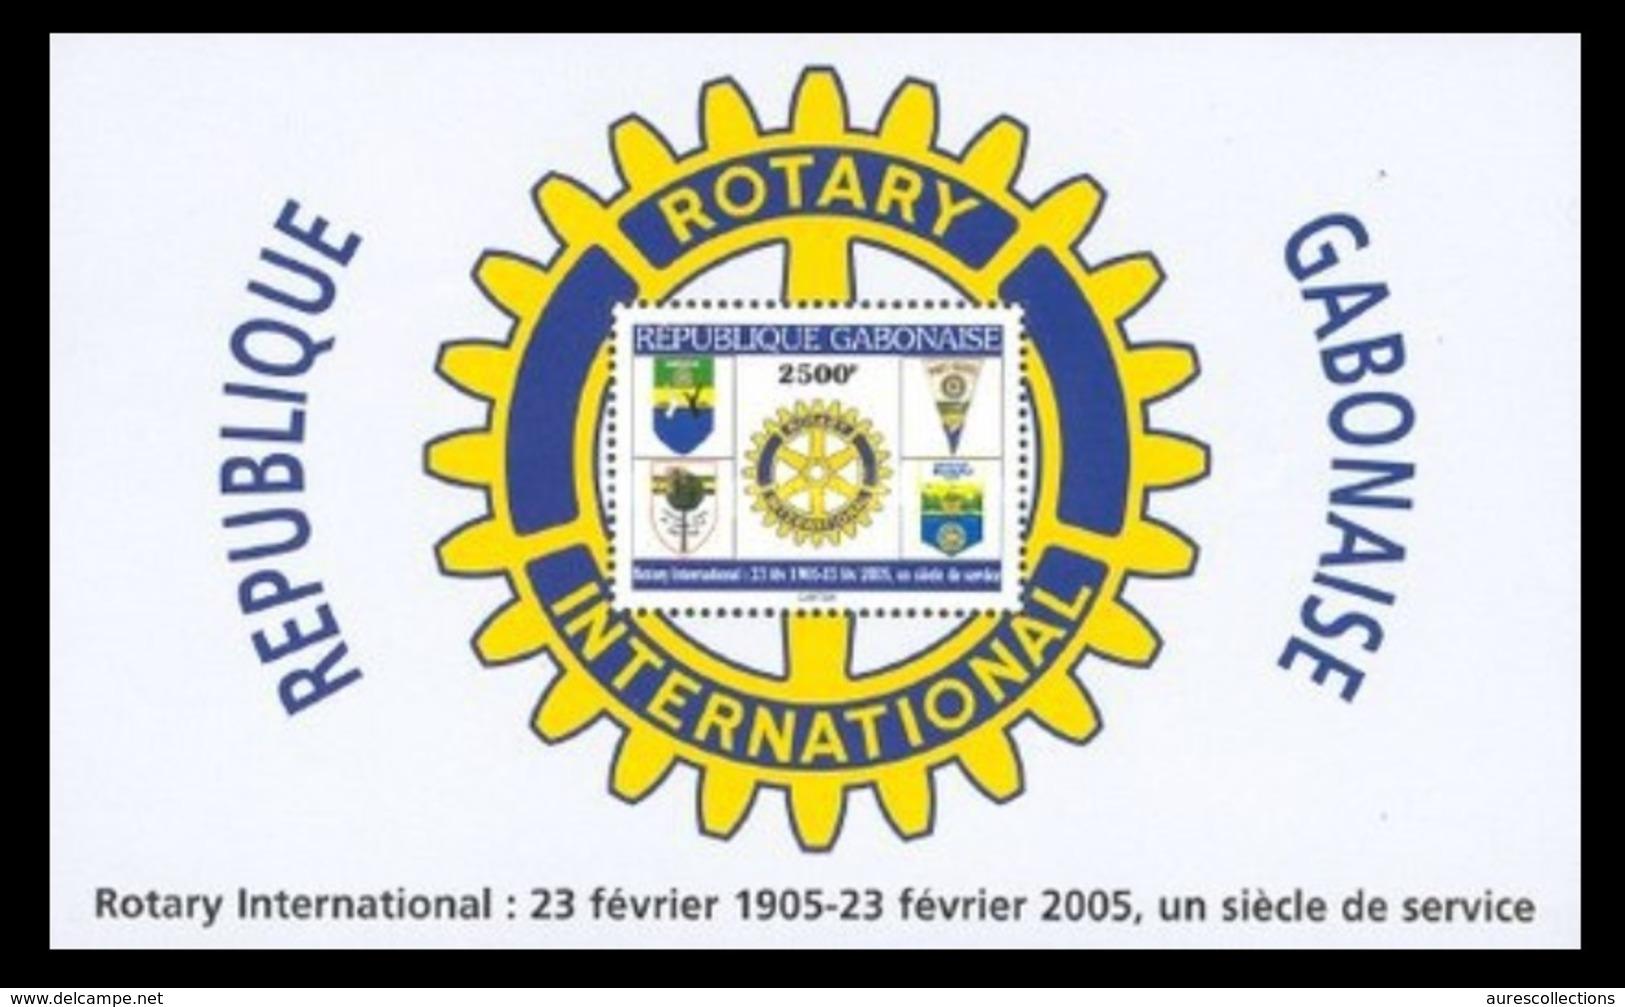 GABON 2005 - ROTARY INTERNATIONAL CENTENARY SOUVENIR SHEET SS BLOC BLOCK - ULTRA RARE MNH - Rotary, Lions Club